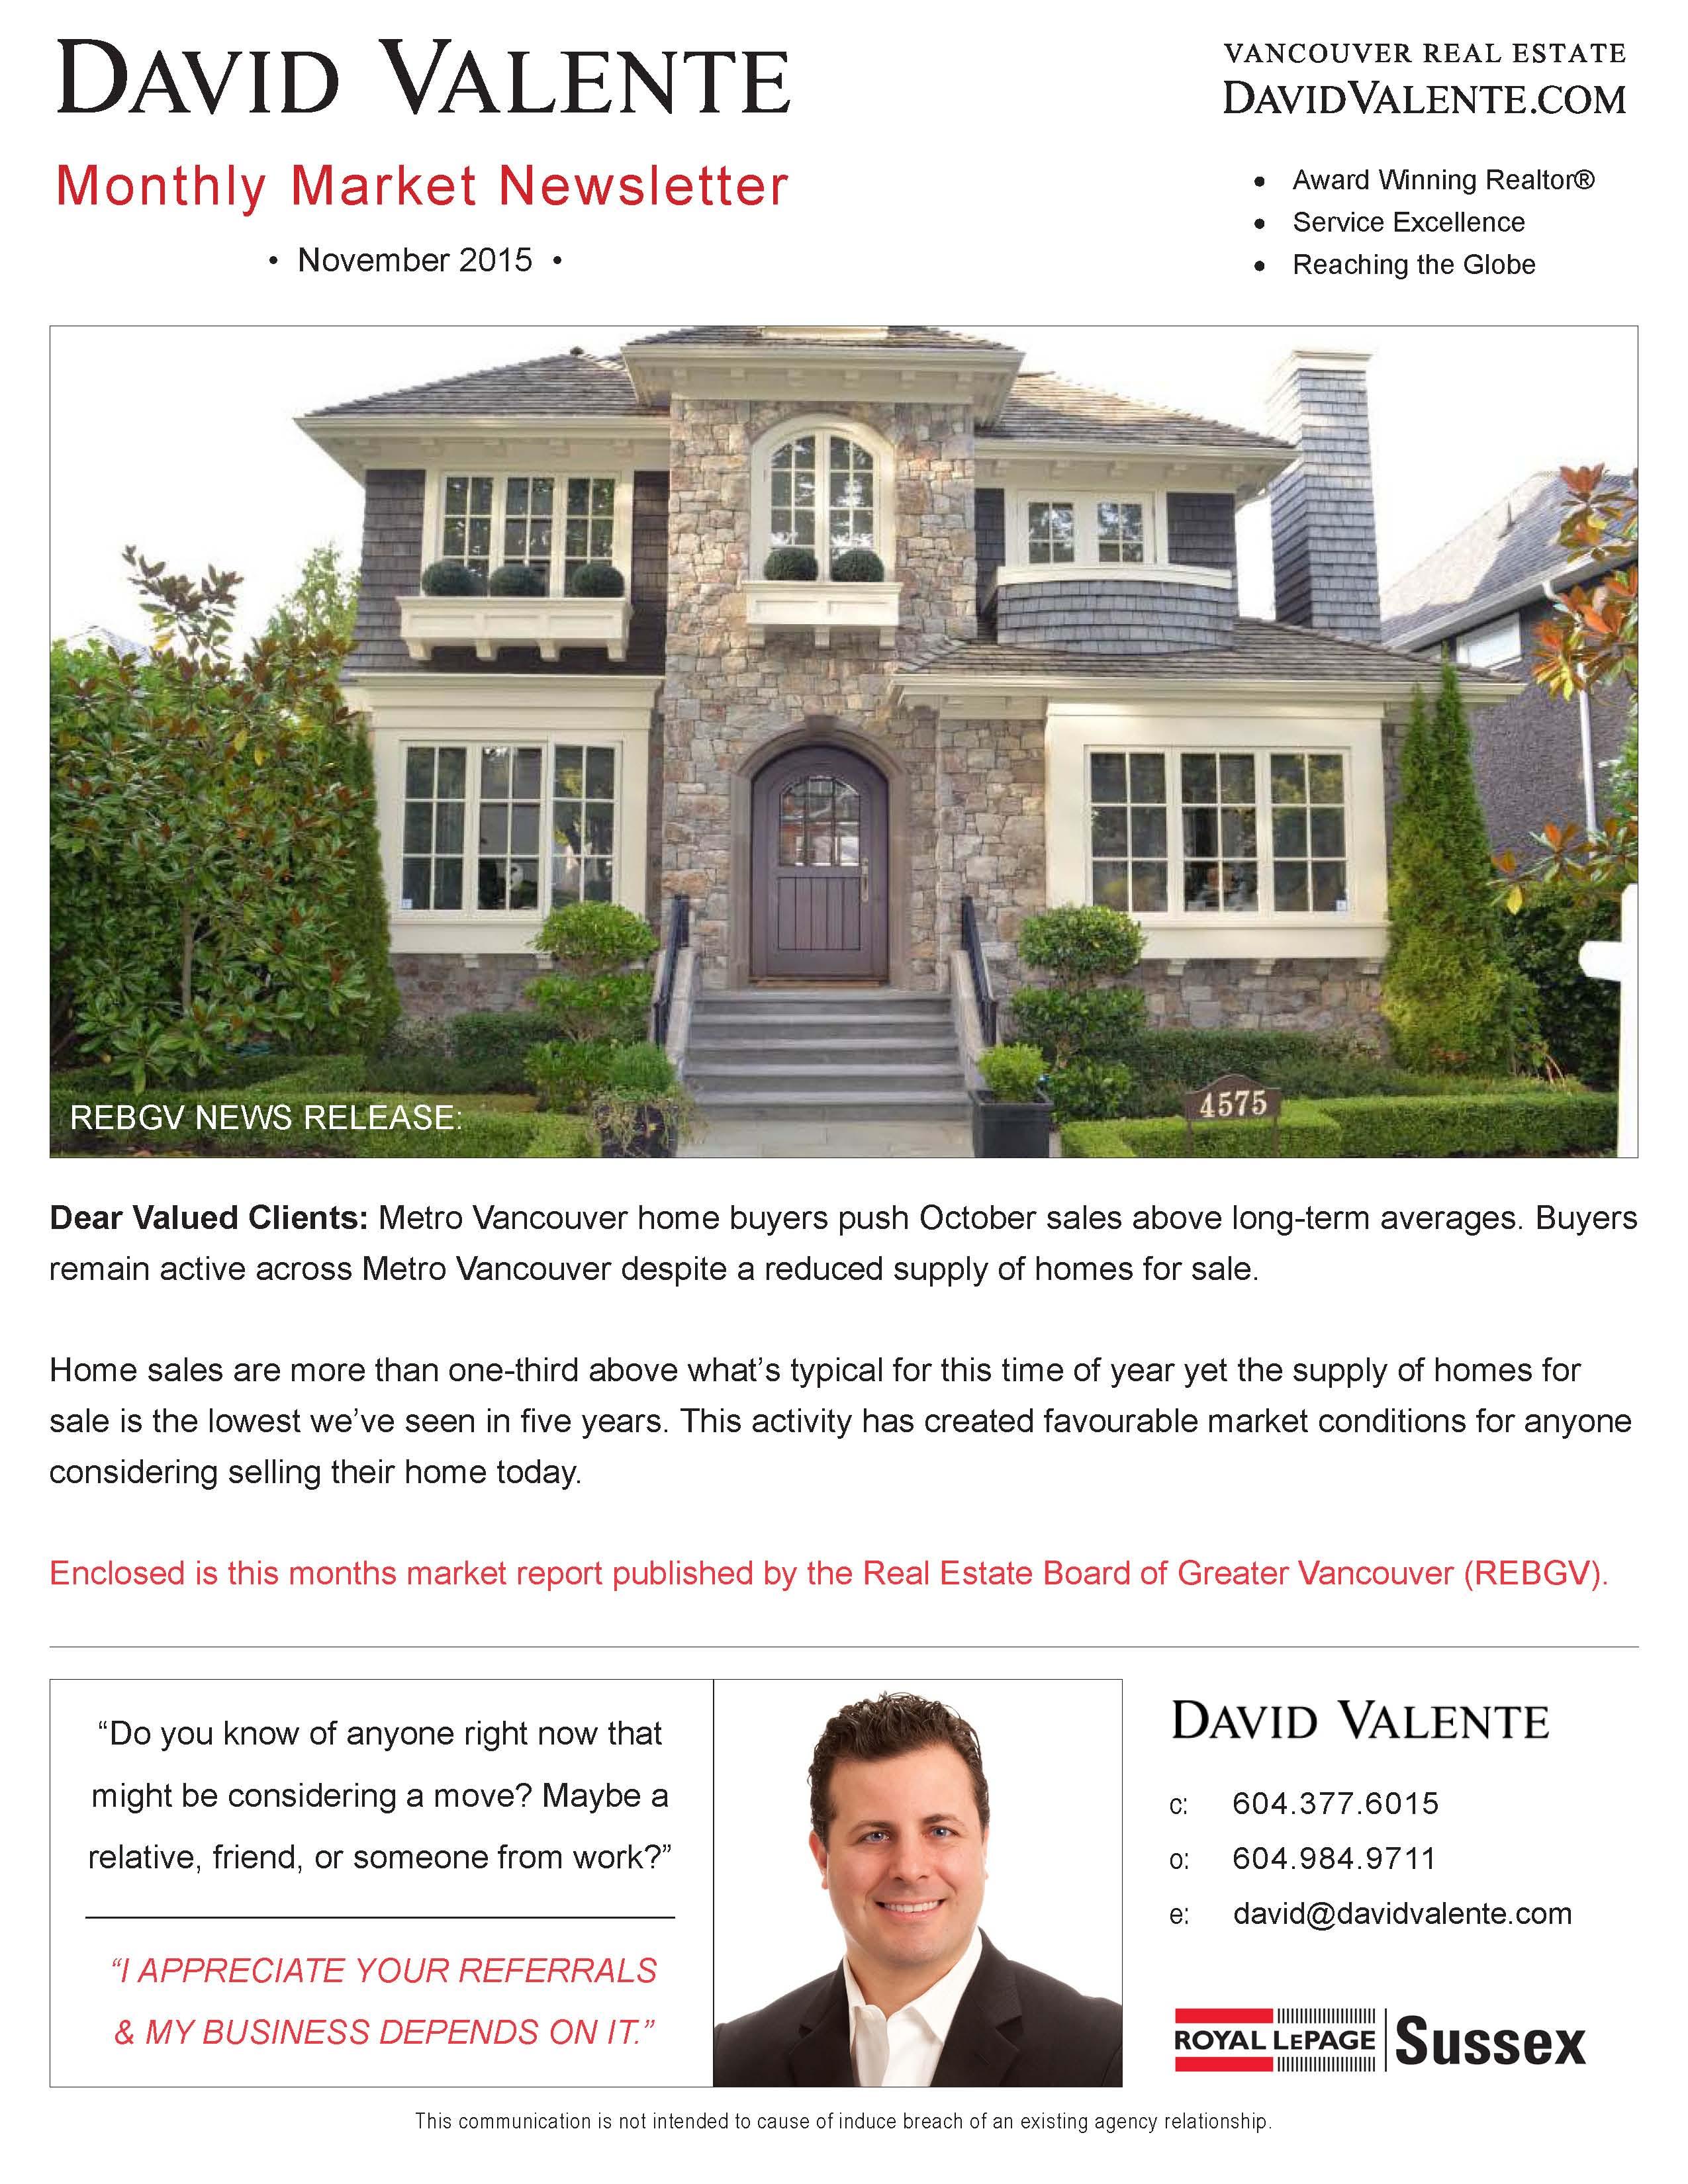 November-2015_MarketNews_VancouverRealEstate_DavidValente_Page_01.jpg